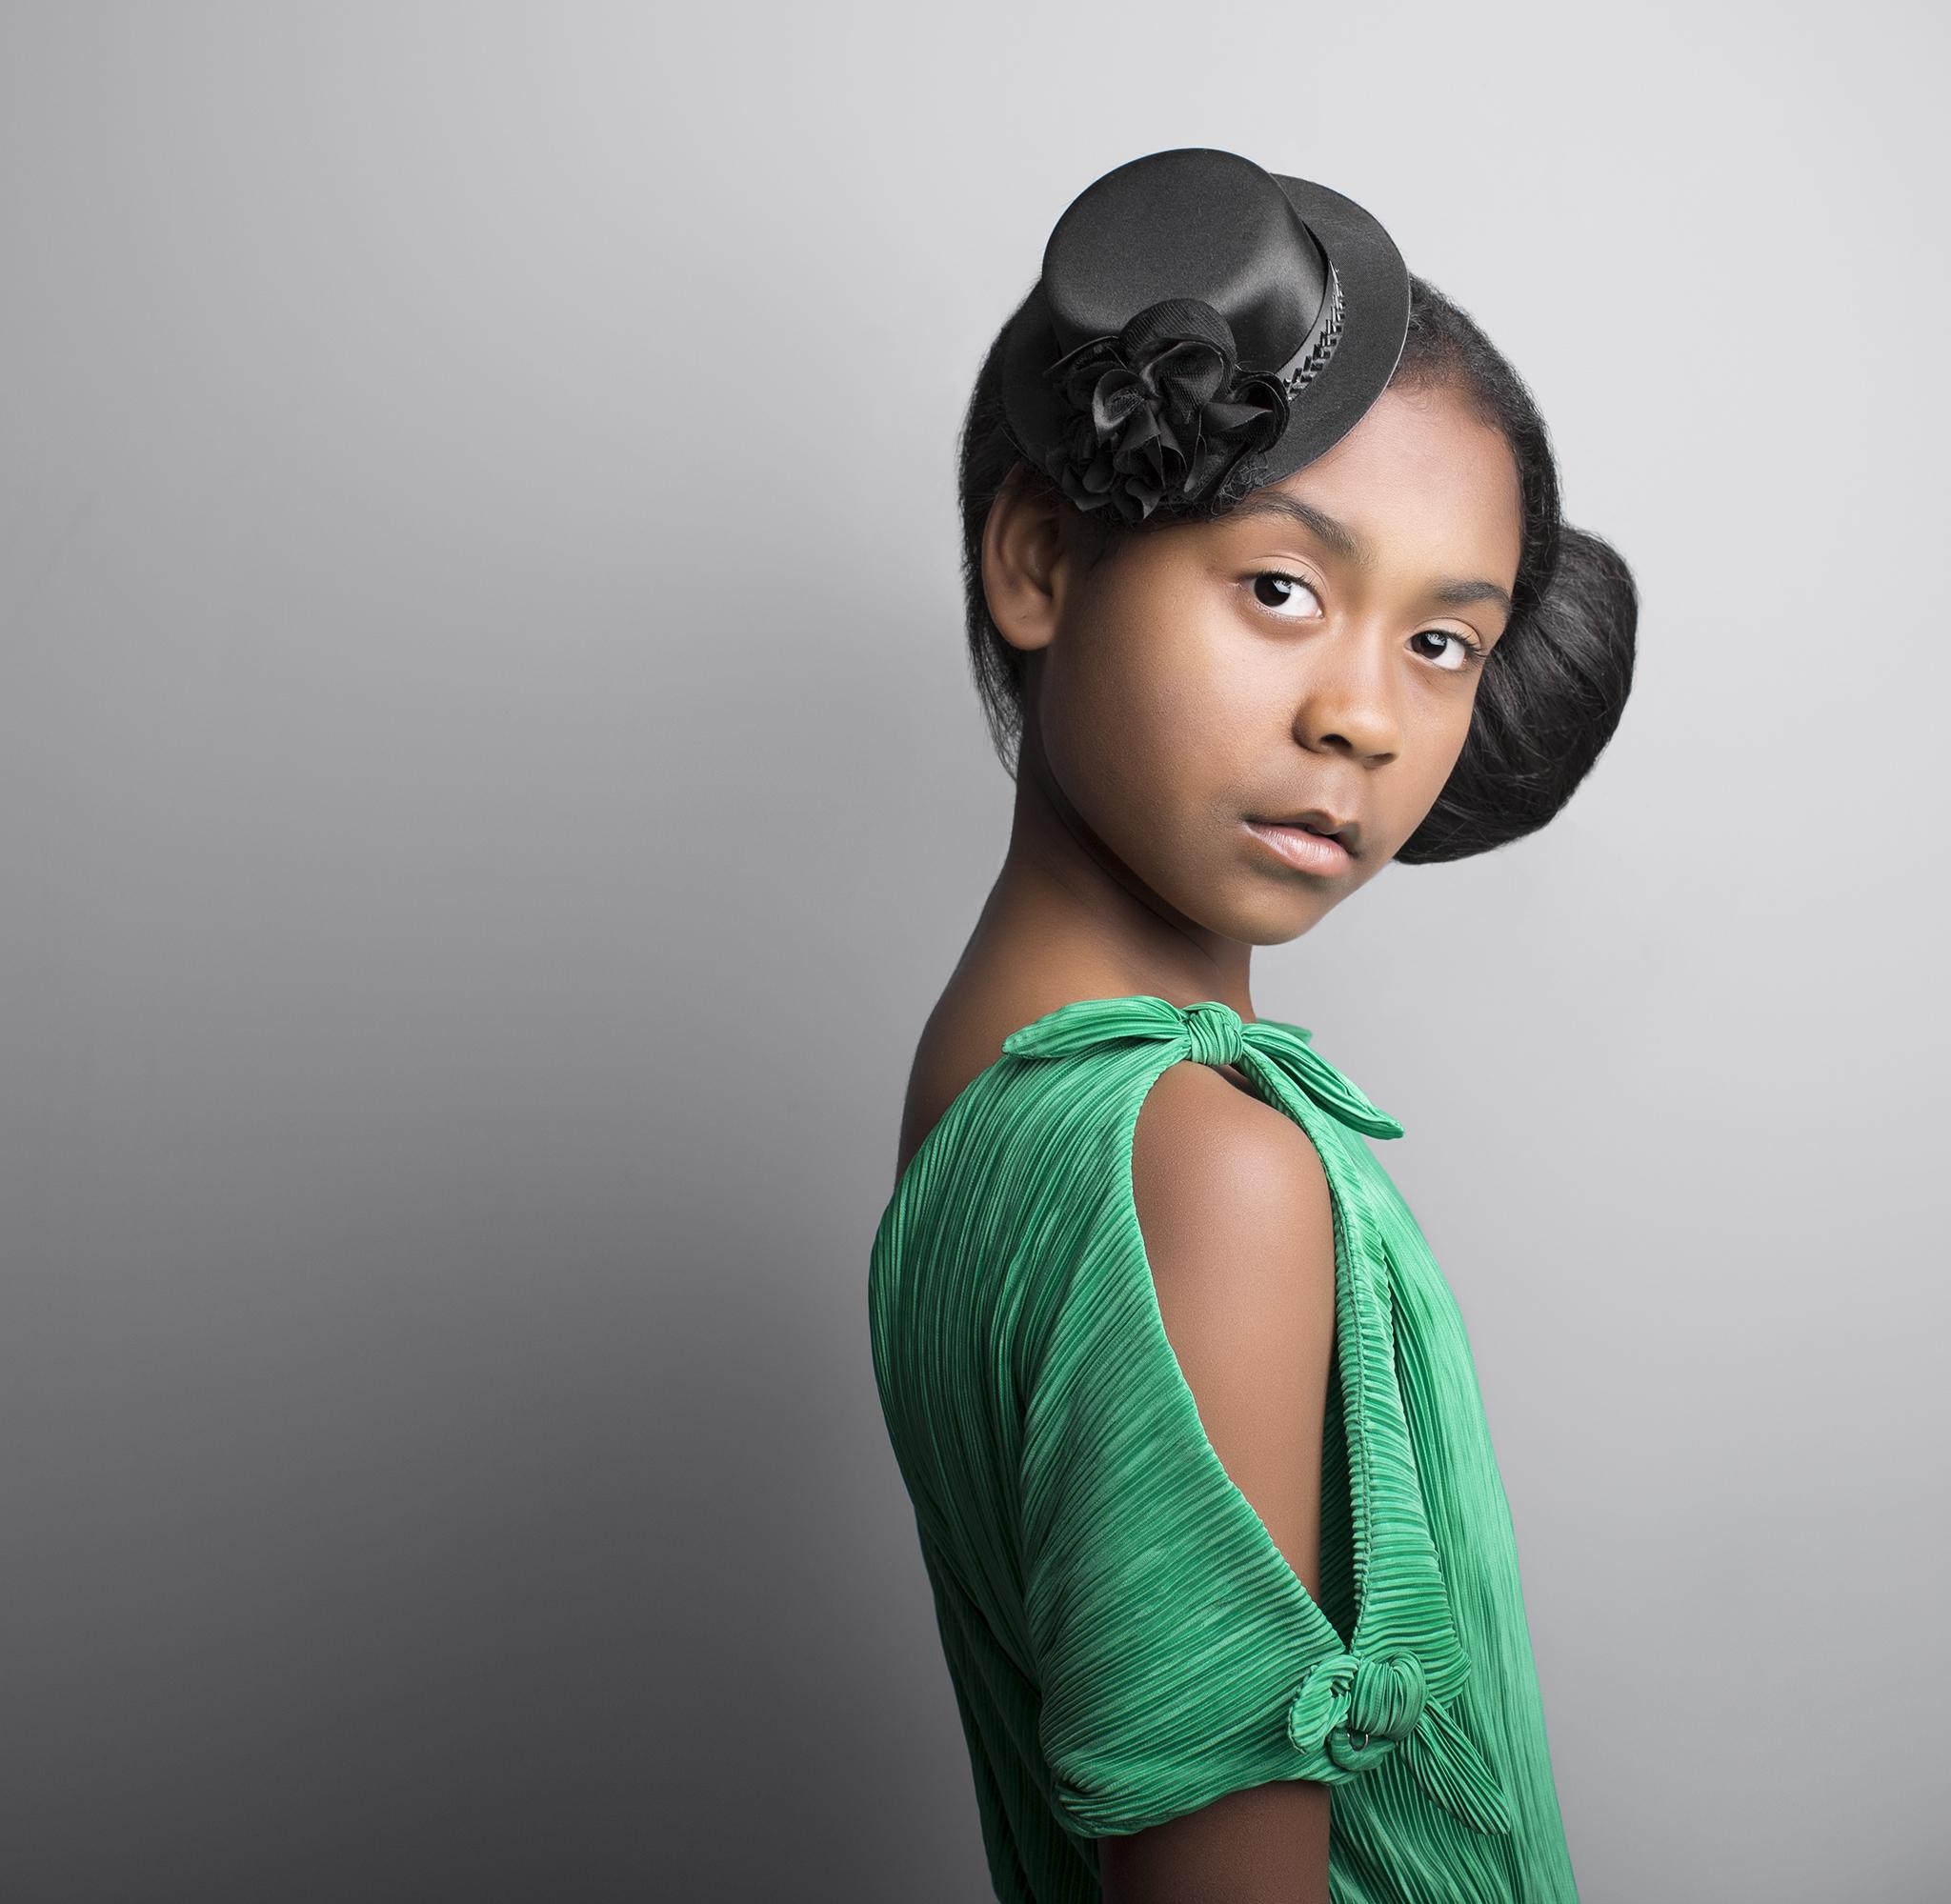 elizabethgphotography_fineart_kingslangley_hertfordshire_child_model_asia-leigh_3.jpg